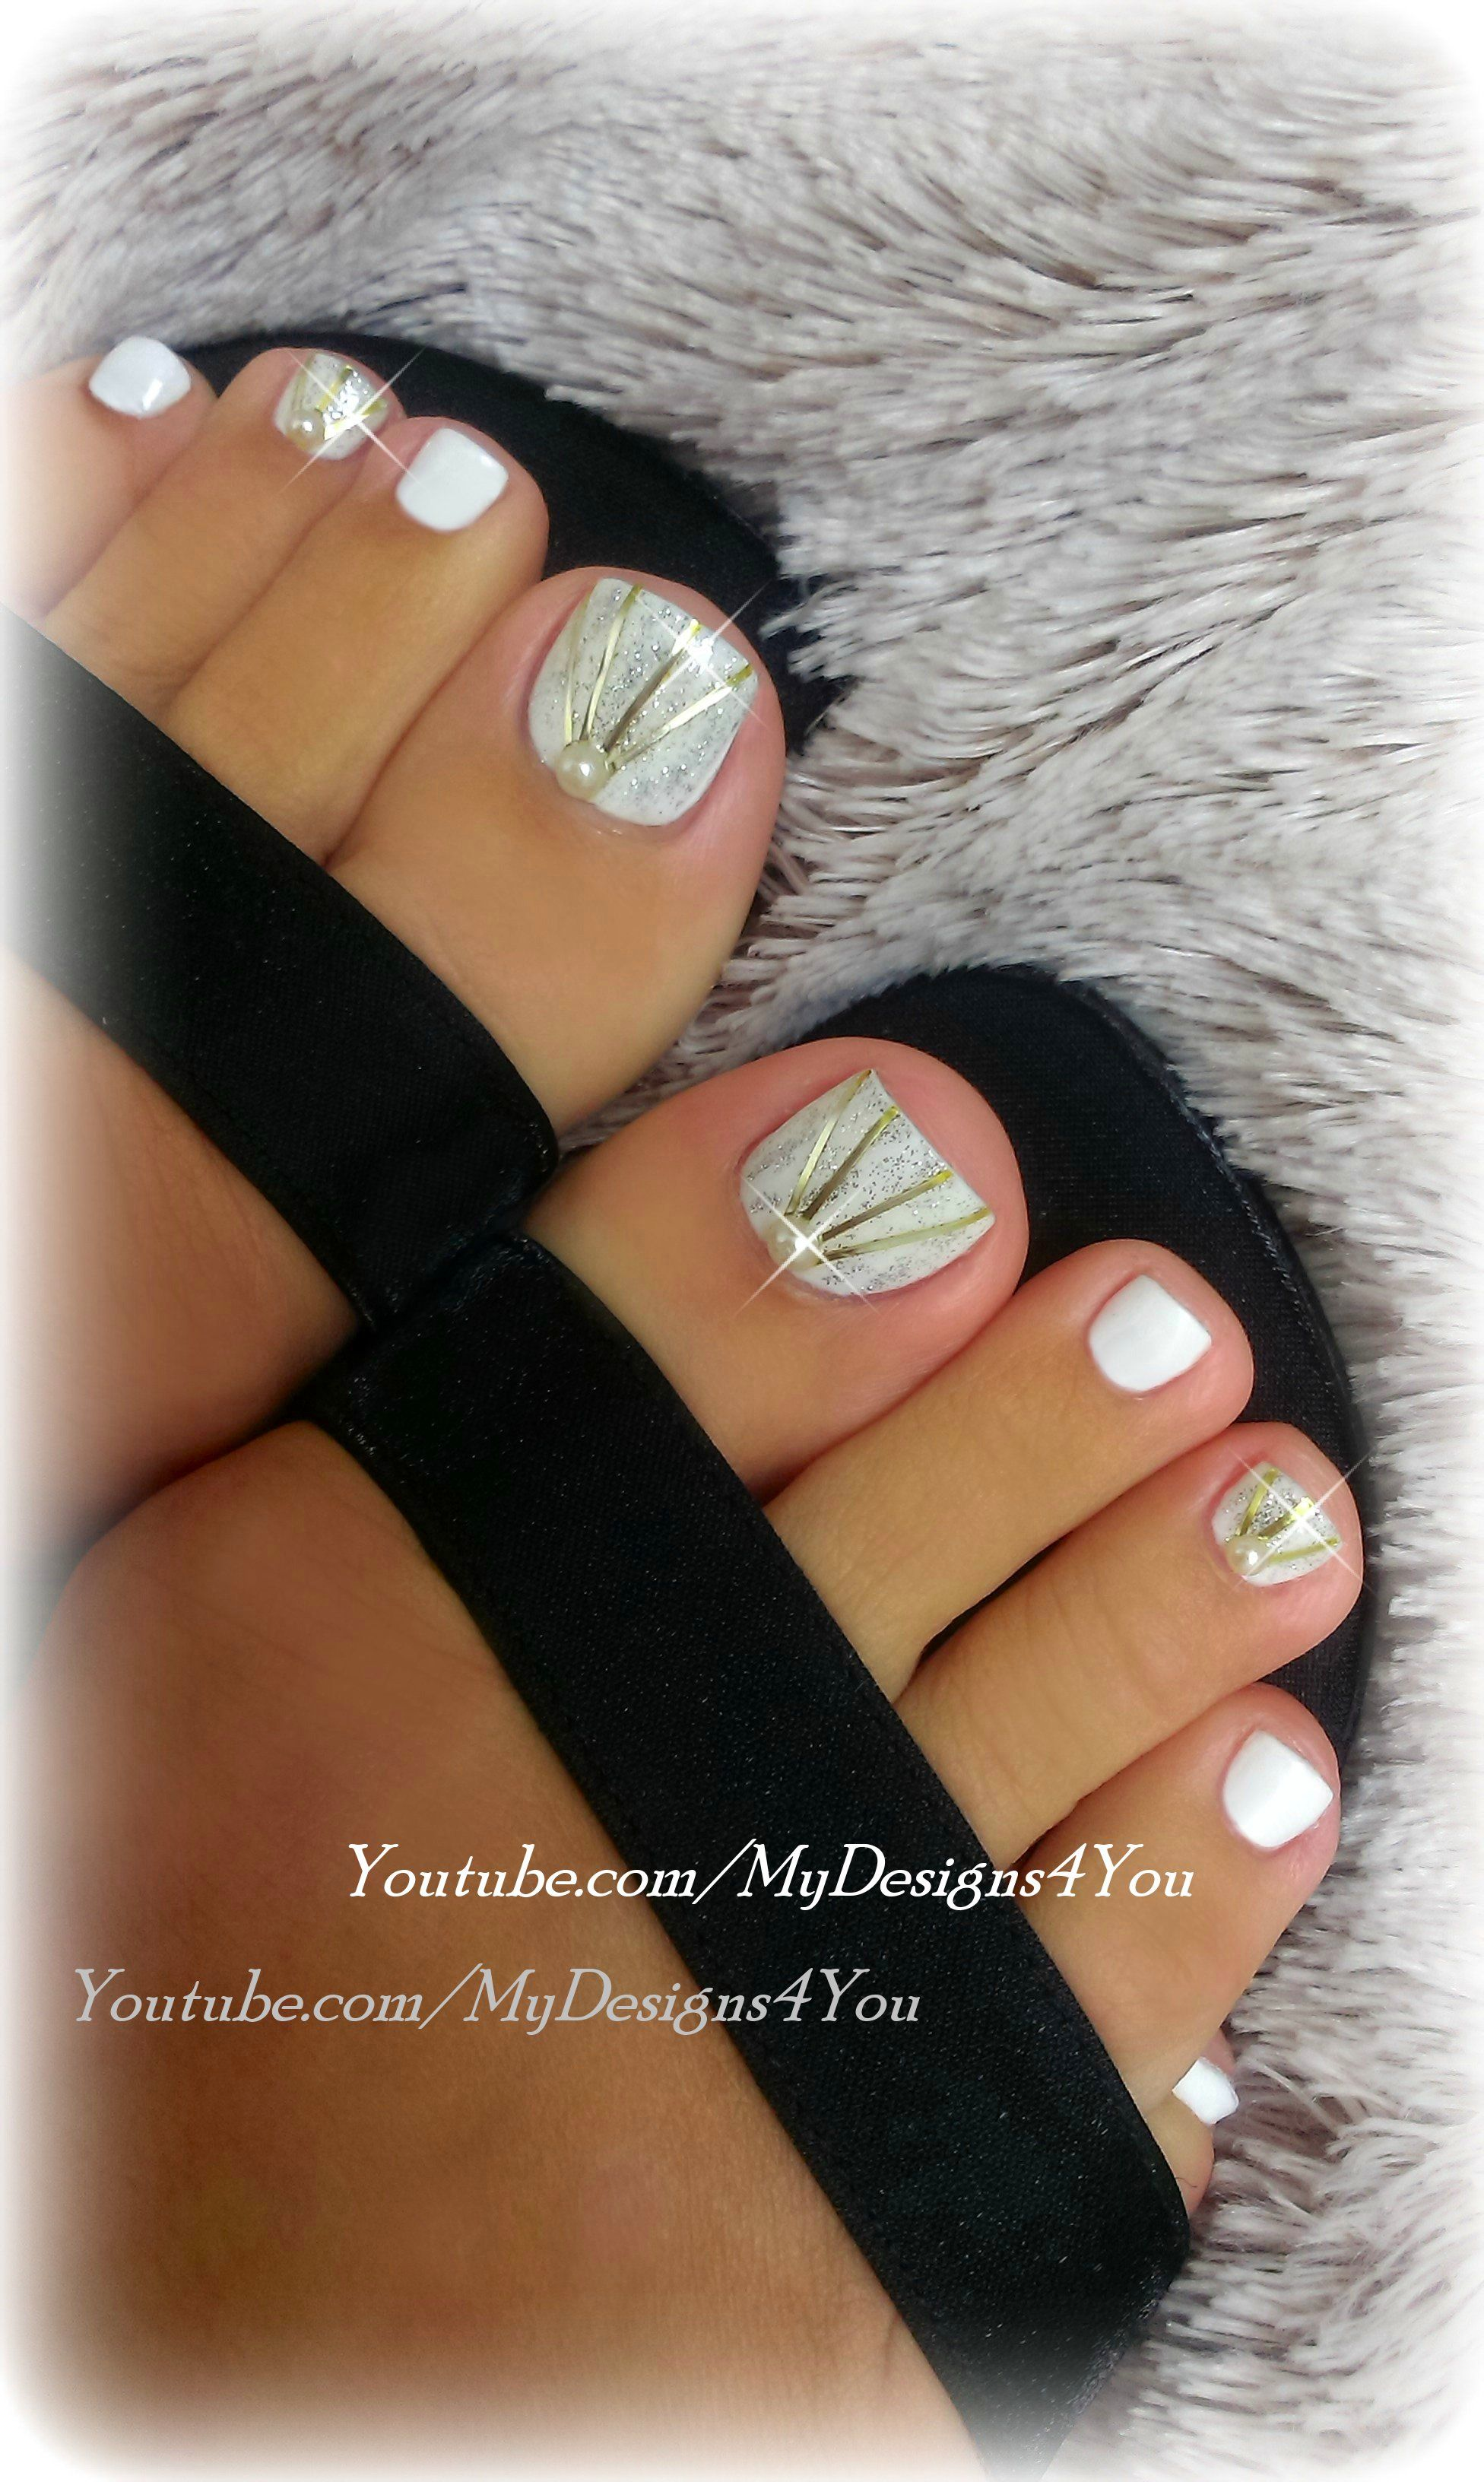 Pq21 manipedi pinterest toenail art designs pedi prinsesfo Images